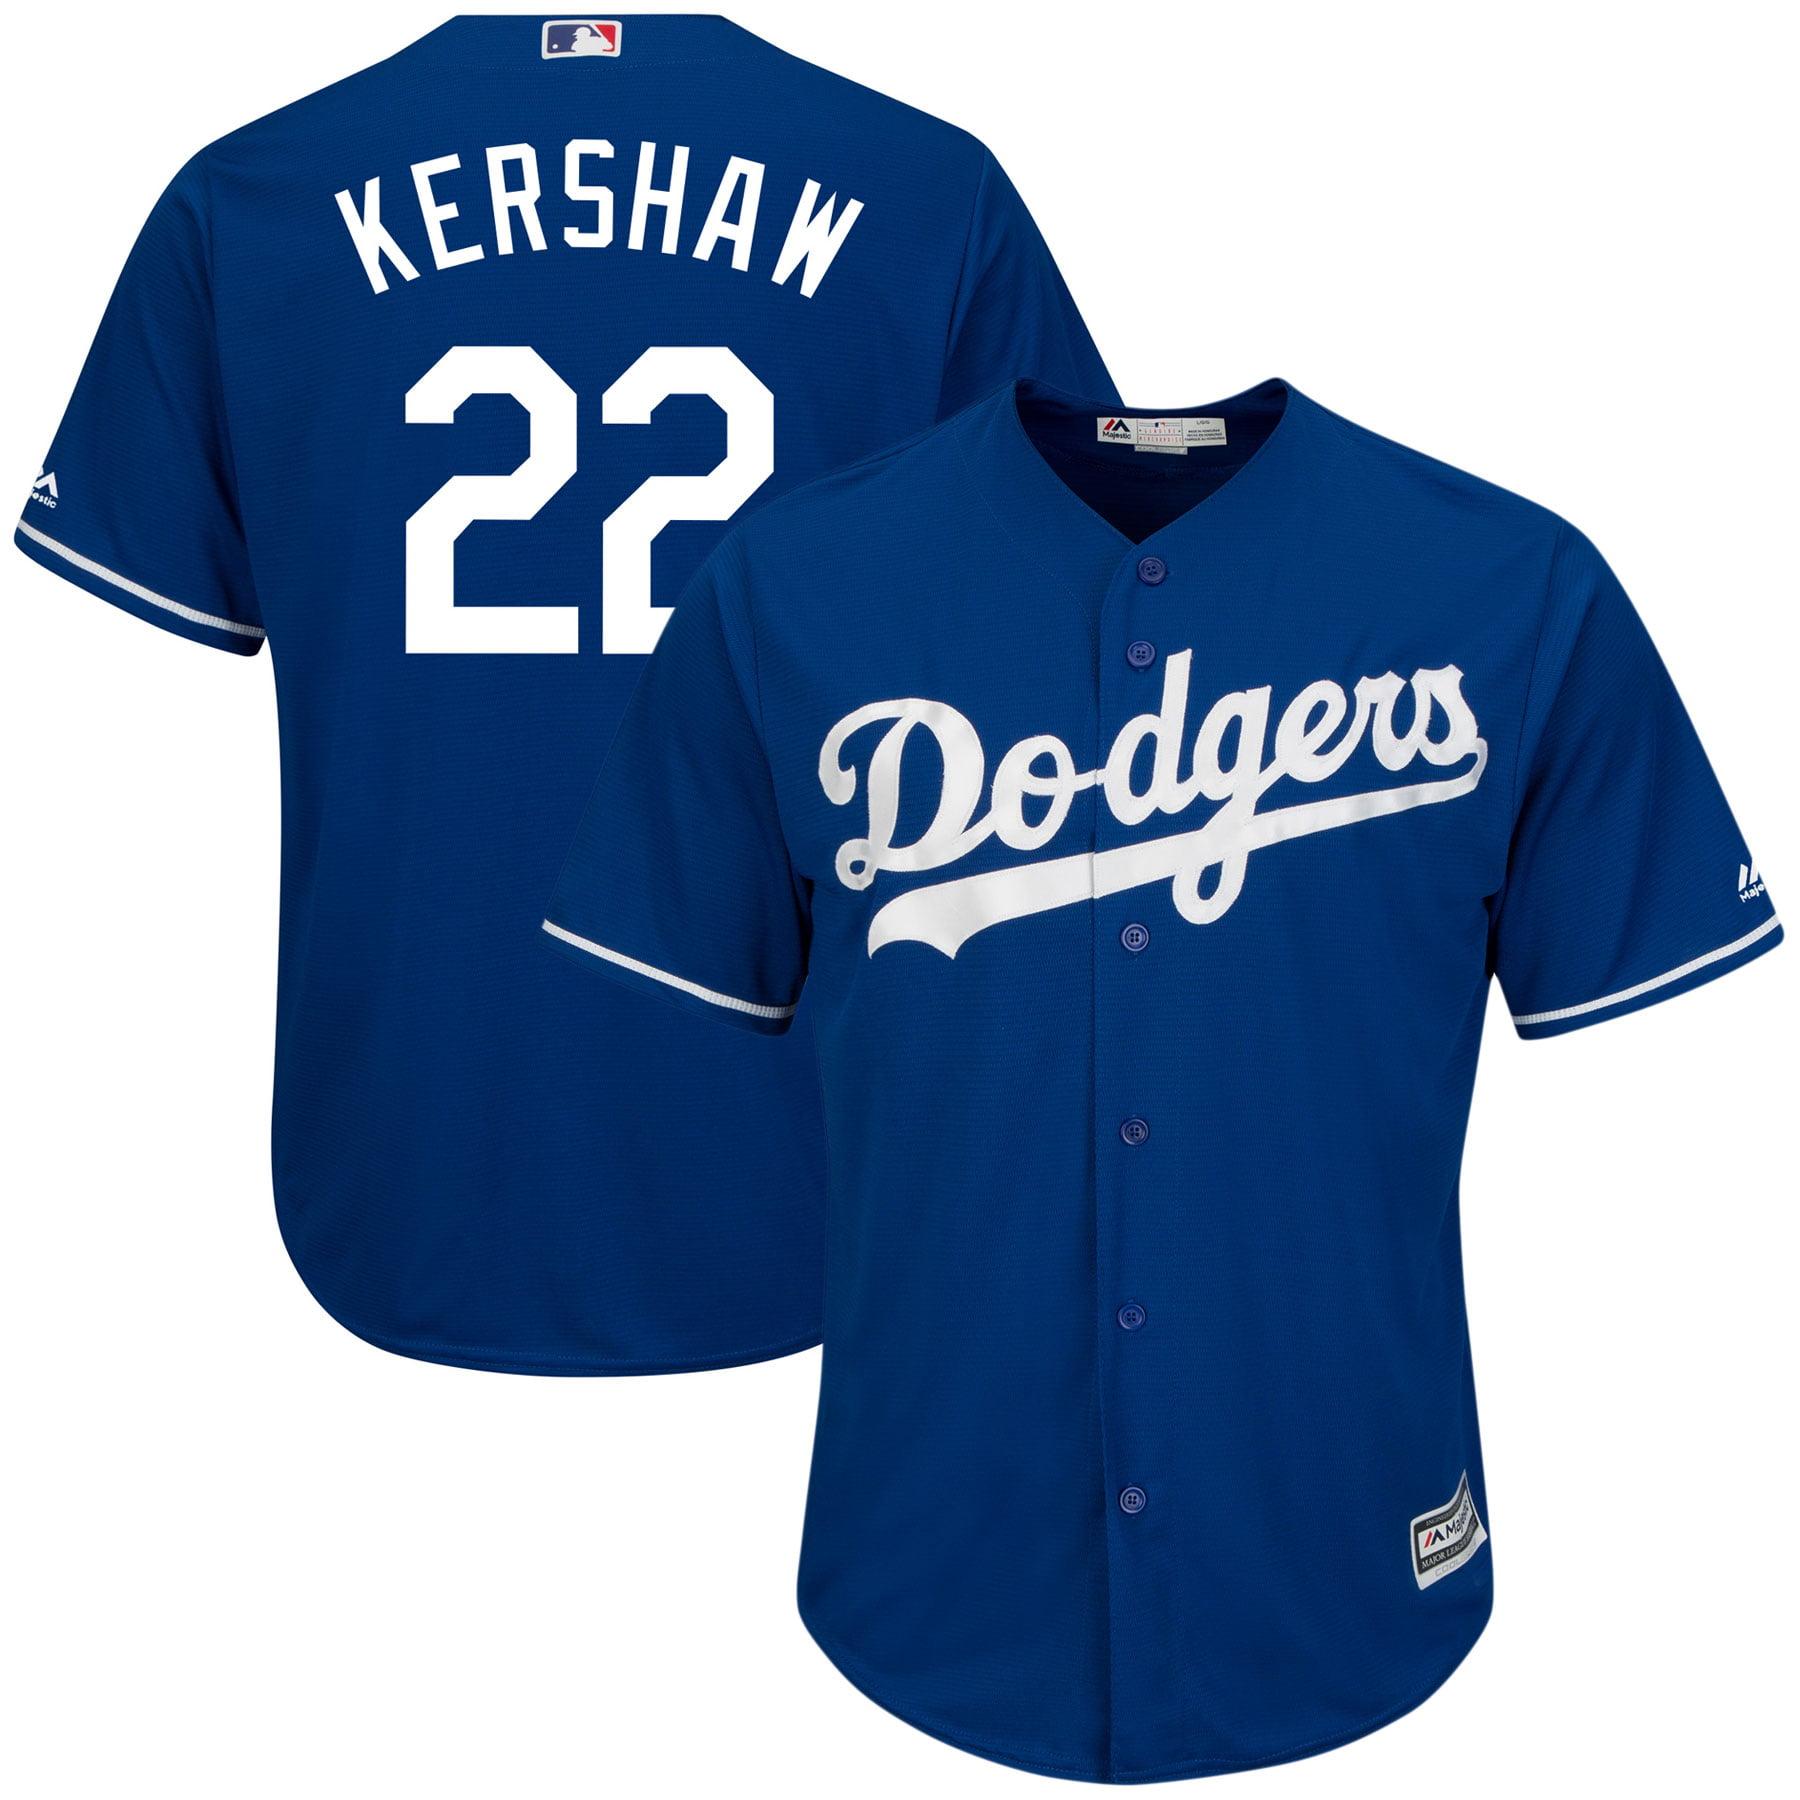 1a026a50 Clayton Kershaw Los Angeles Dodgers Majestic Big & Tall Alternate Cool Base  Replica Player Jersey - Royal - Walmart.com